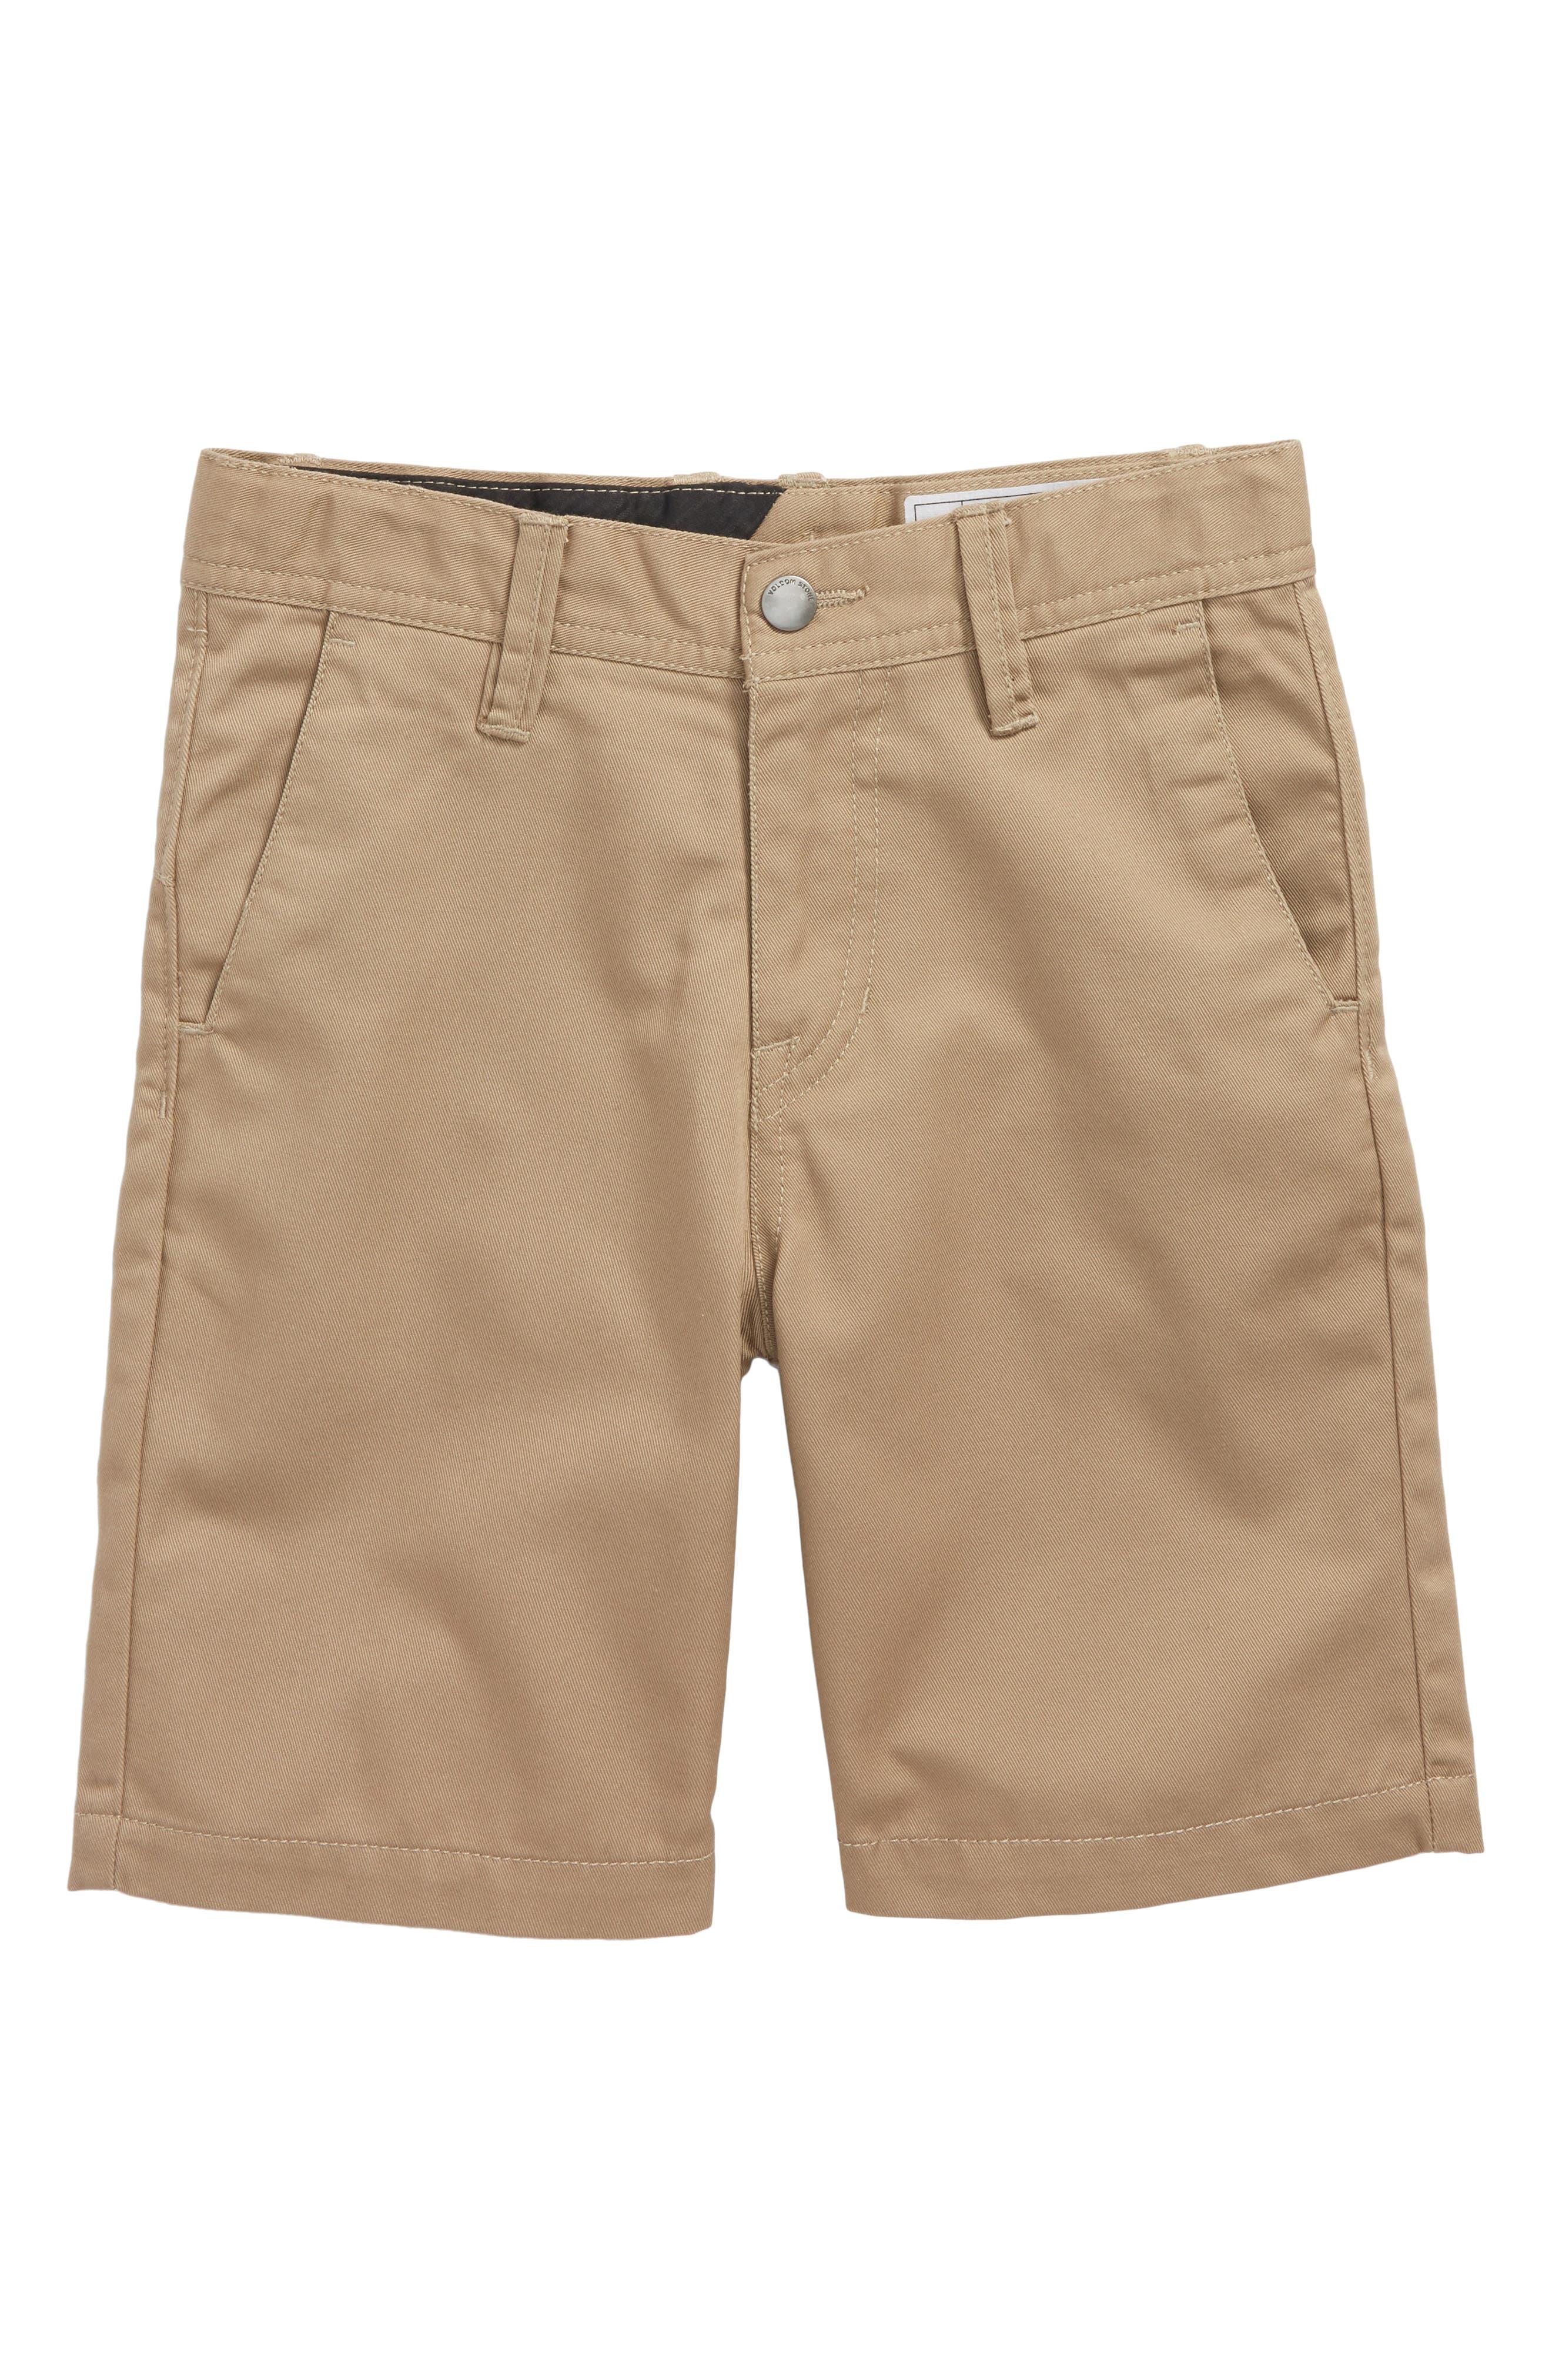 Alternate Image 1 Selected - Volcom Chino Shorts (Toddler Boys & Little Boys)